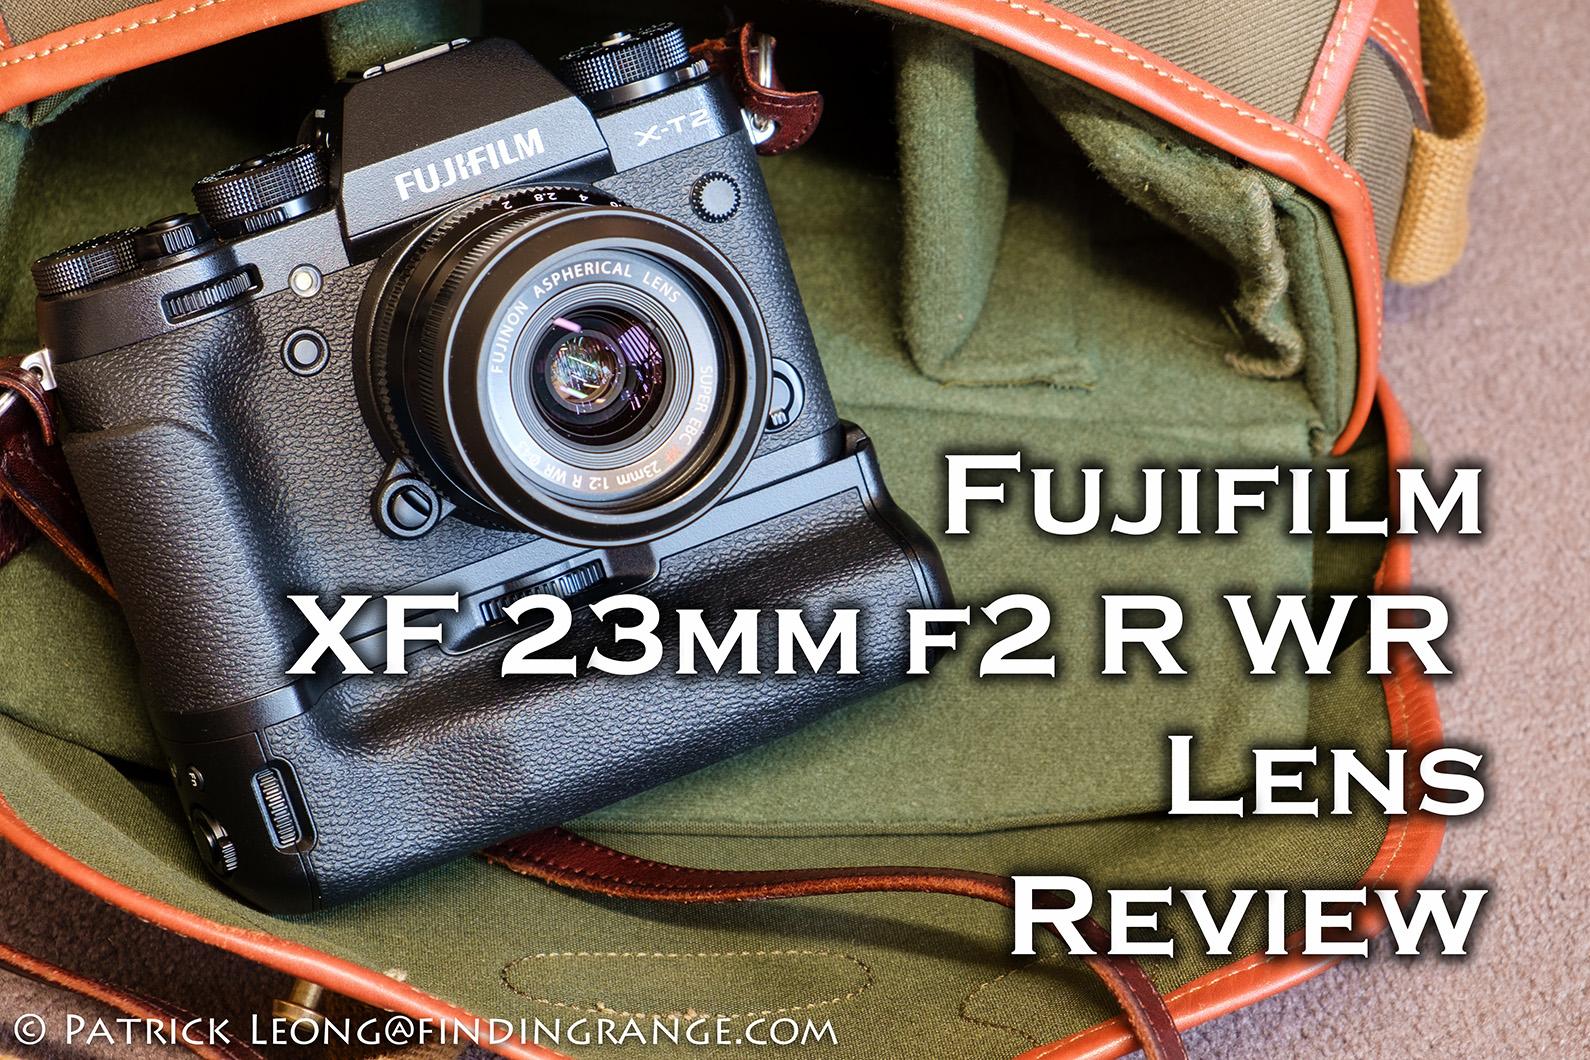 fuji-x-t2-xf-23mm-f2-r-wr-lens-review-vpb-xt2-vertical-booster-grip-2